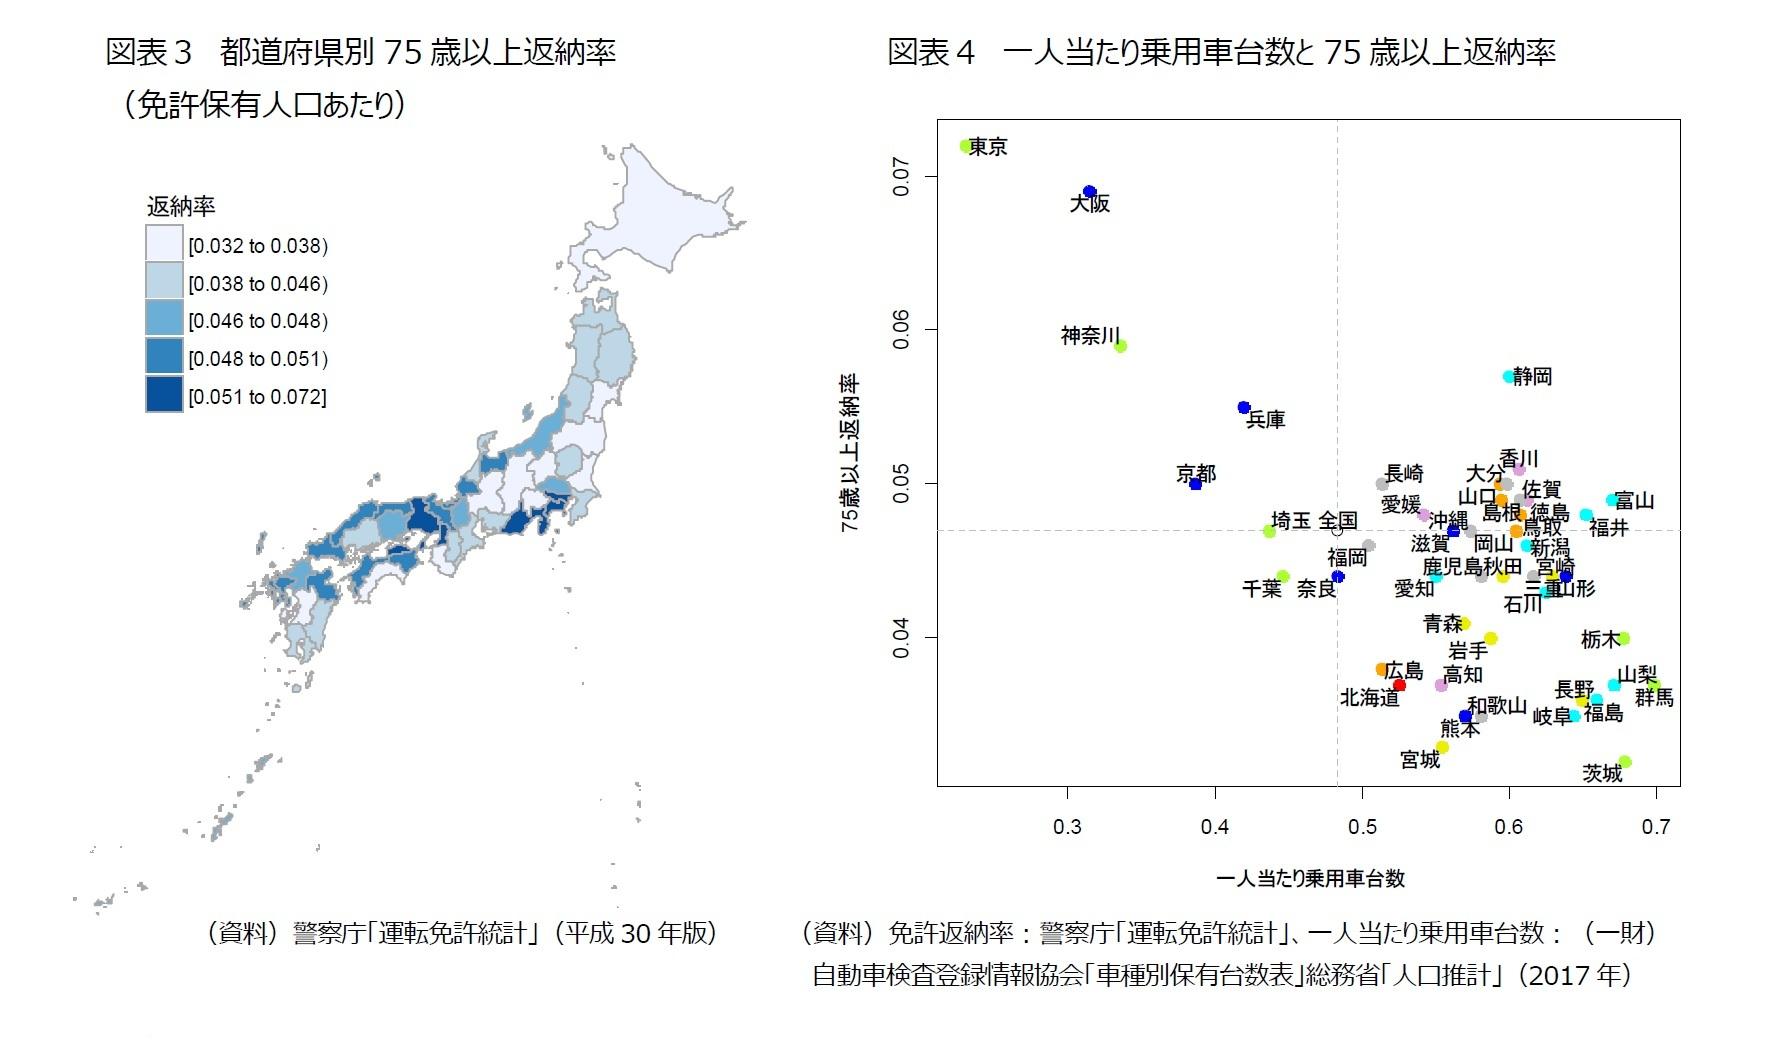 図表3 都道府県別75歳以上返納率(免許保有人口あたり)/図表4 一人当たり乗用車台数と75歳以上返納率